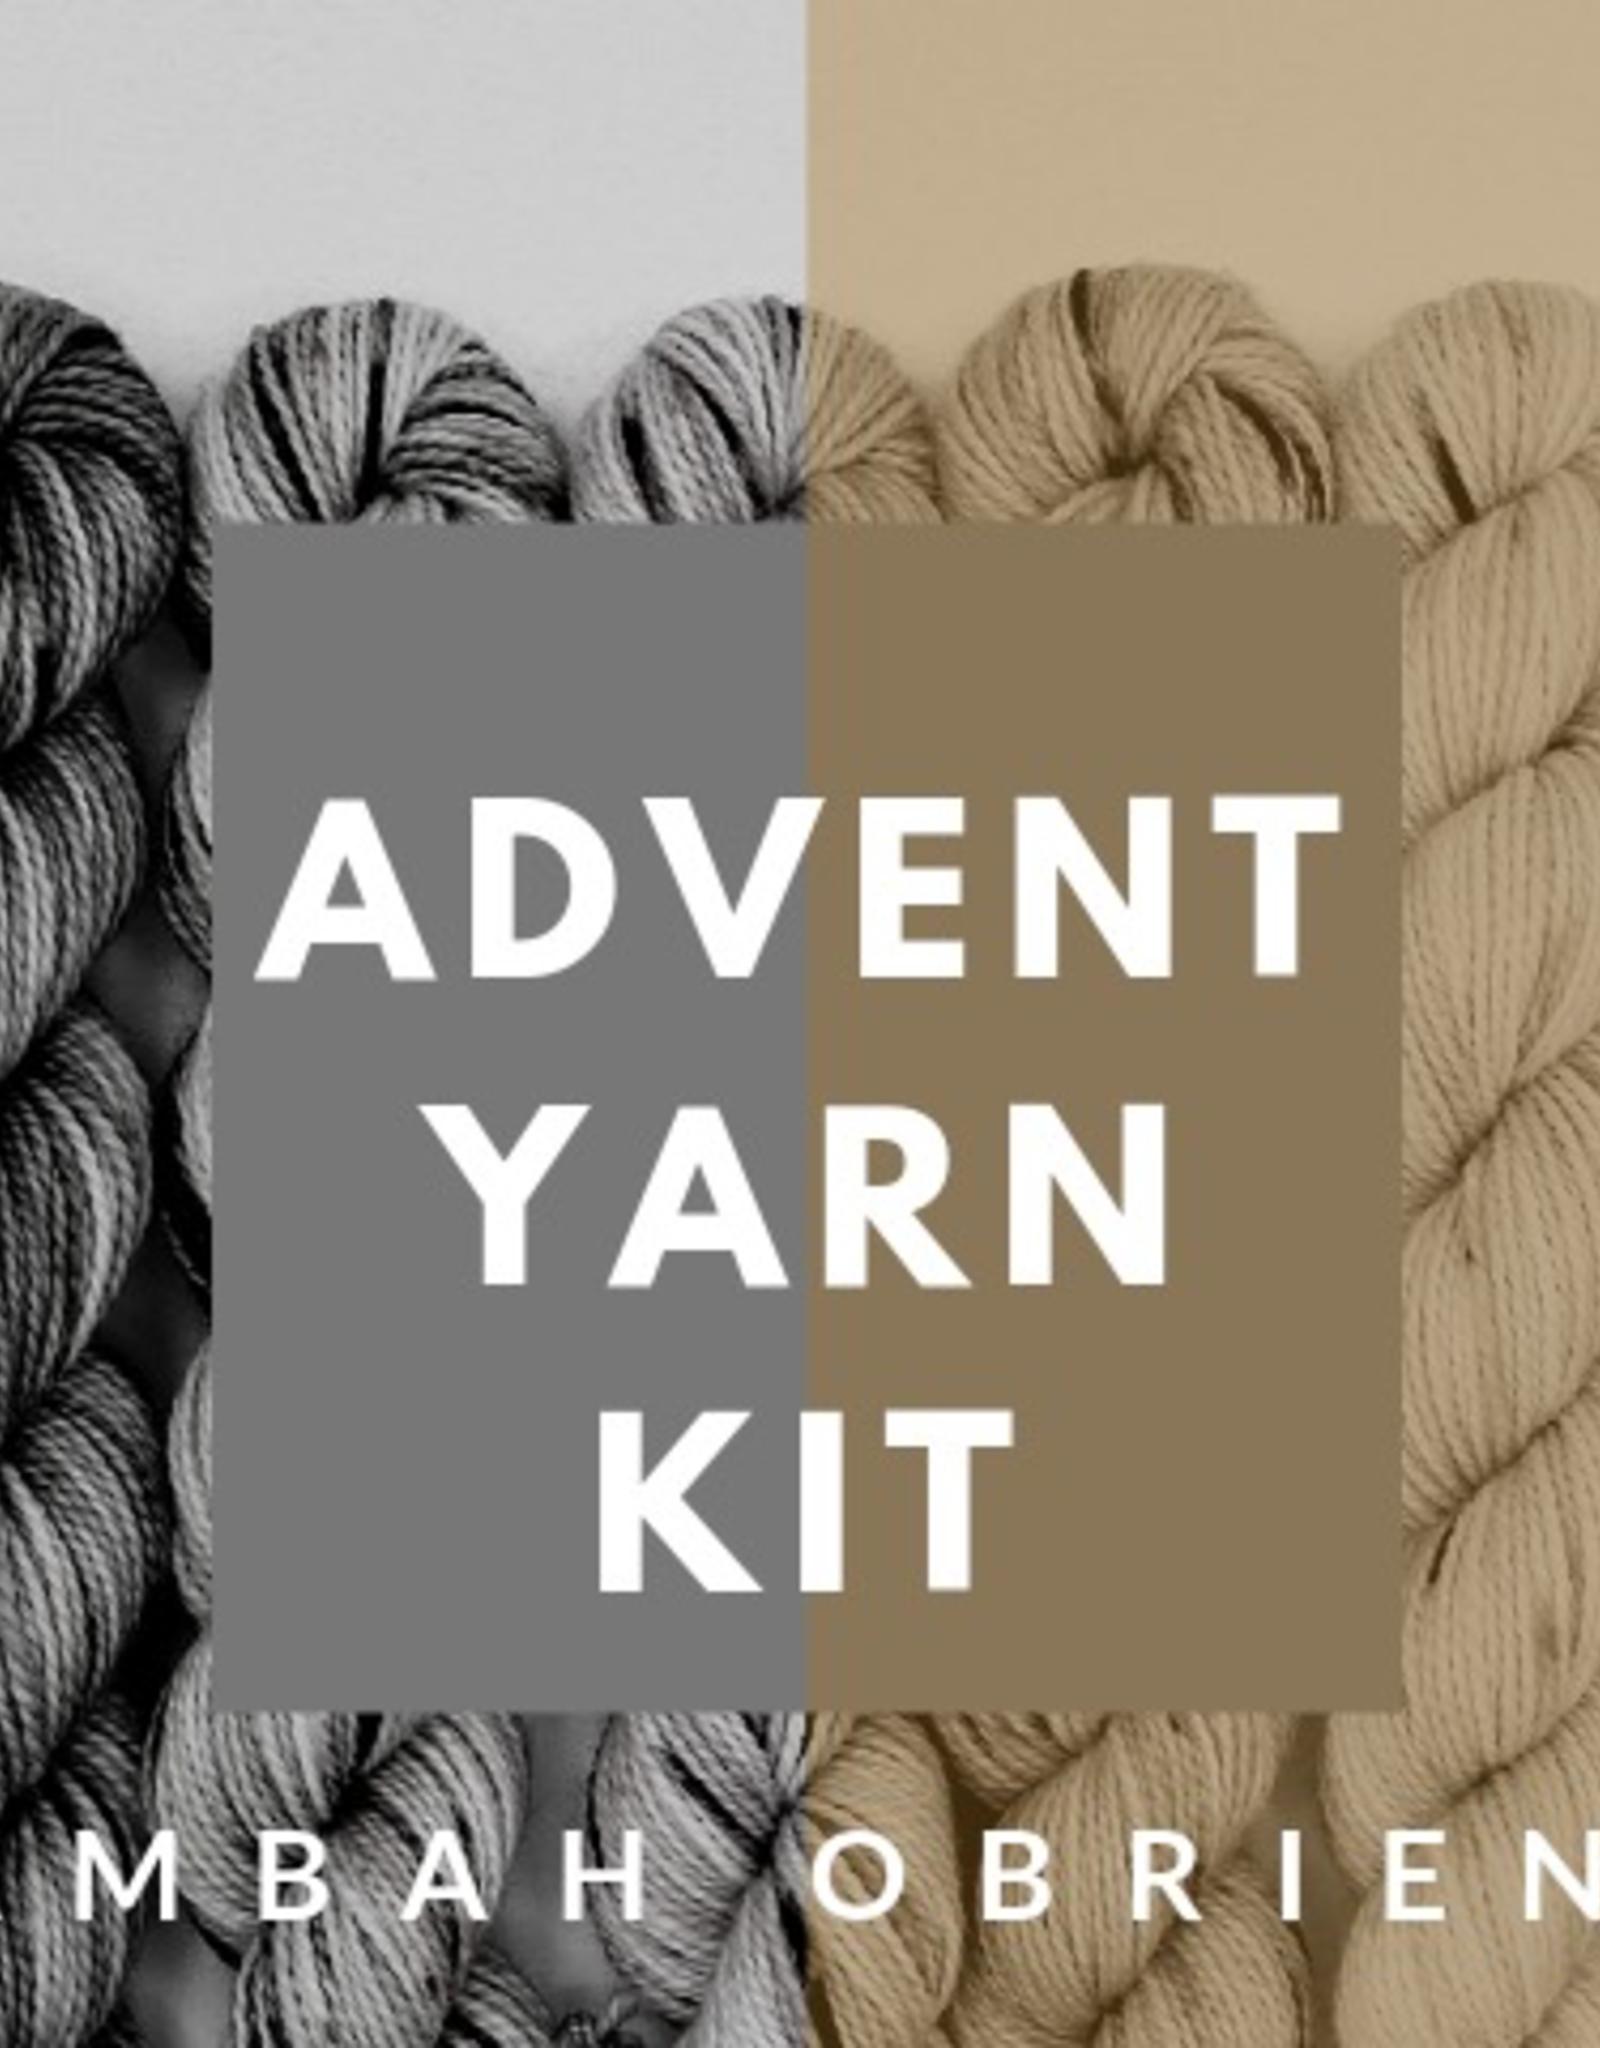 Baah Yarns Baah / Ambah O'Brien 2020 Advent Kit